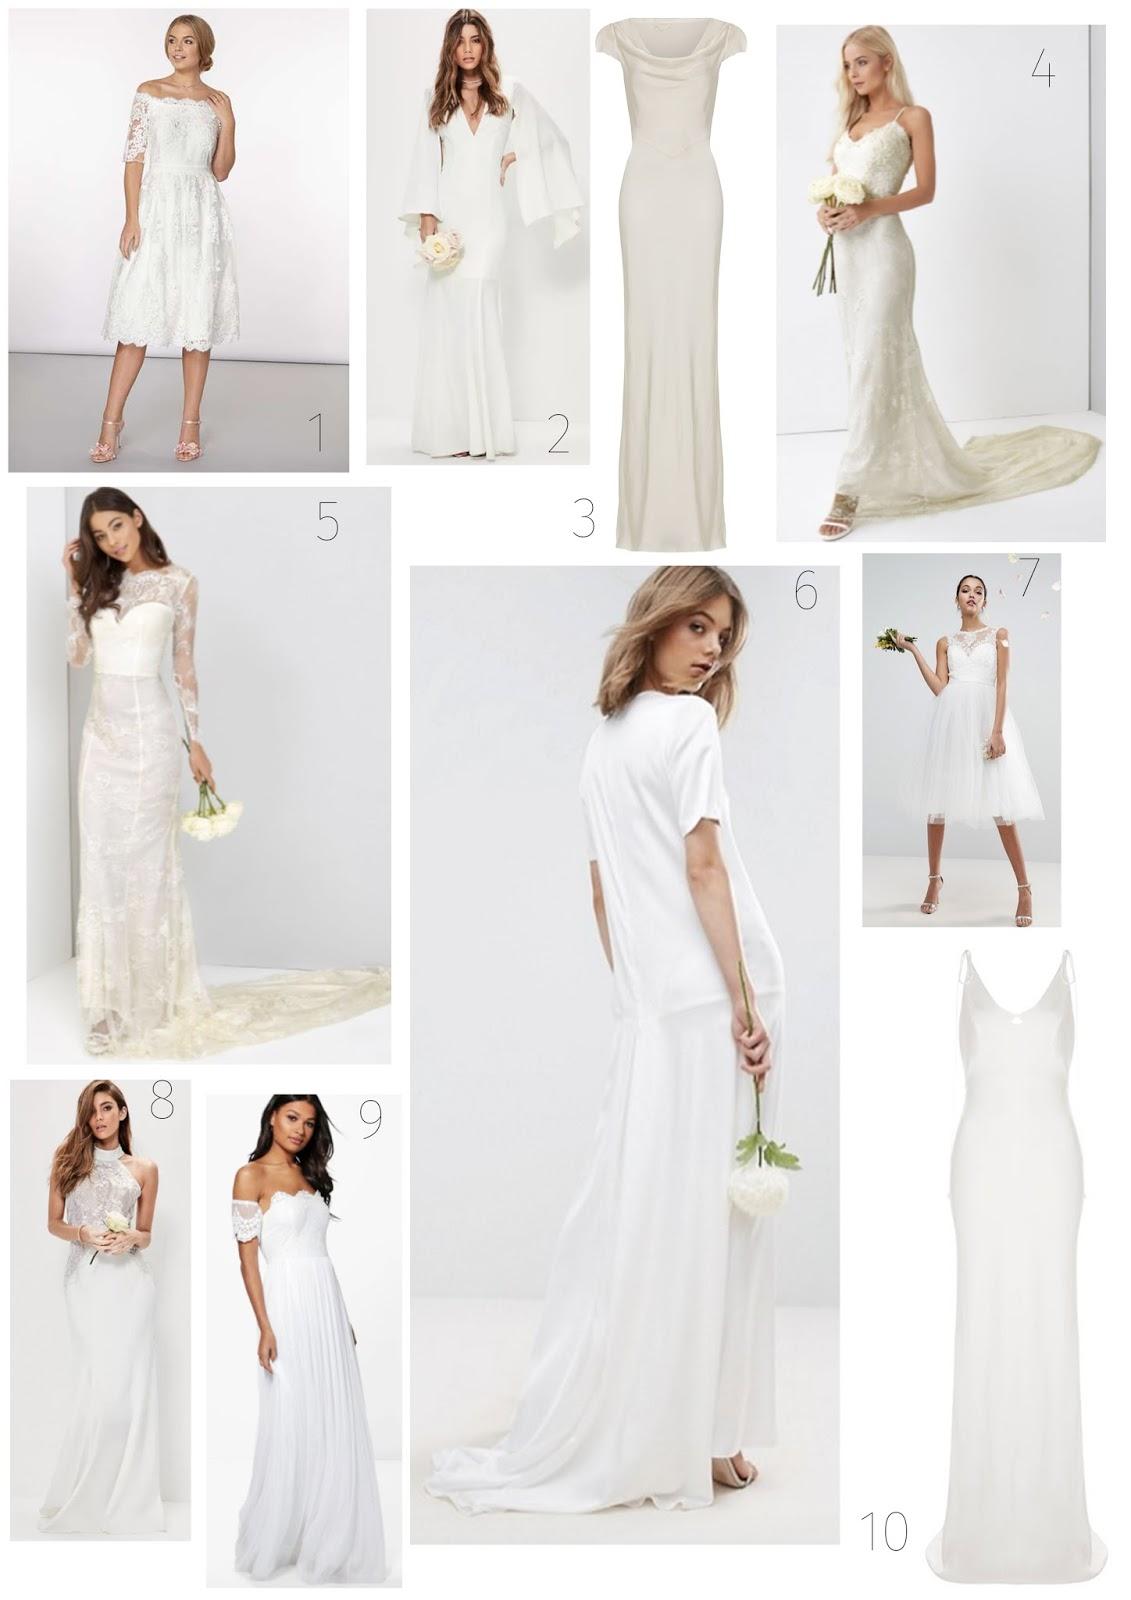 Top Ten Wedding Dresses from the Highstreet (£350 & Under) - Studs ...